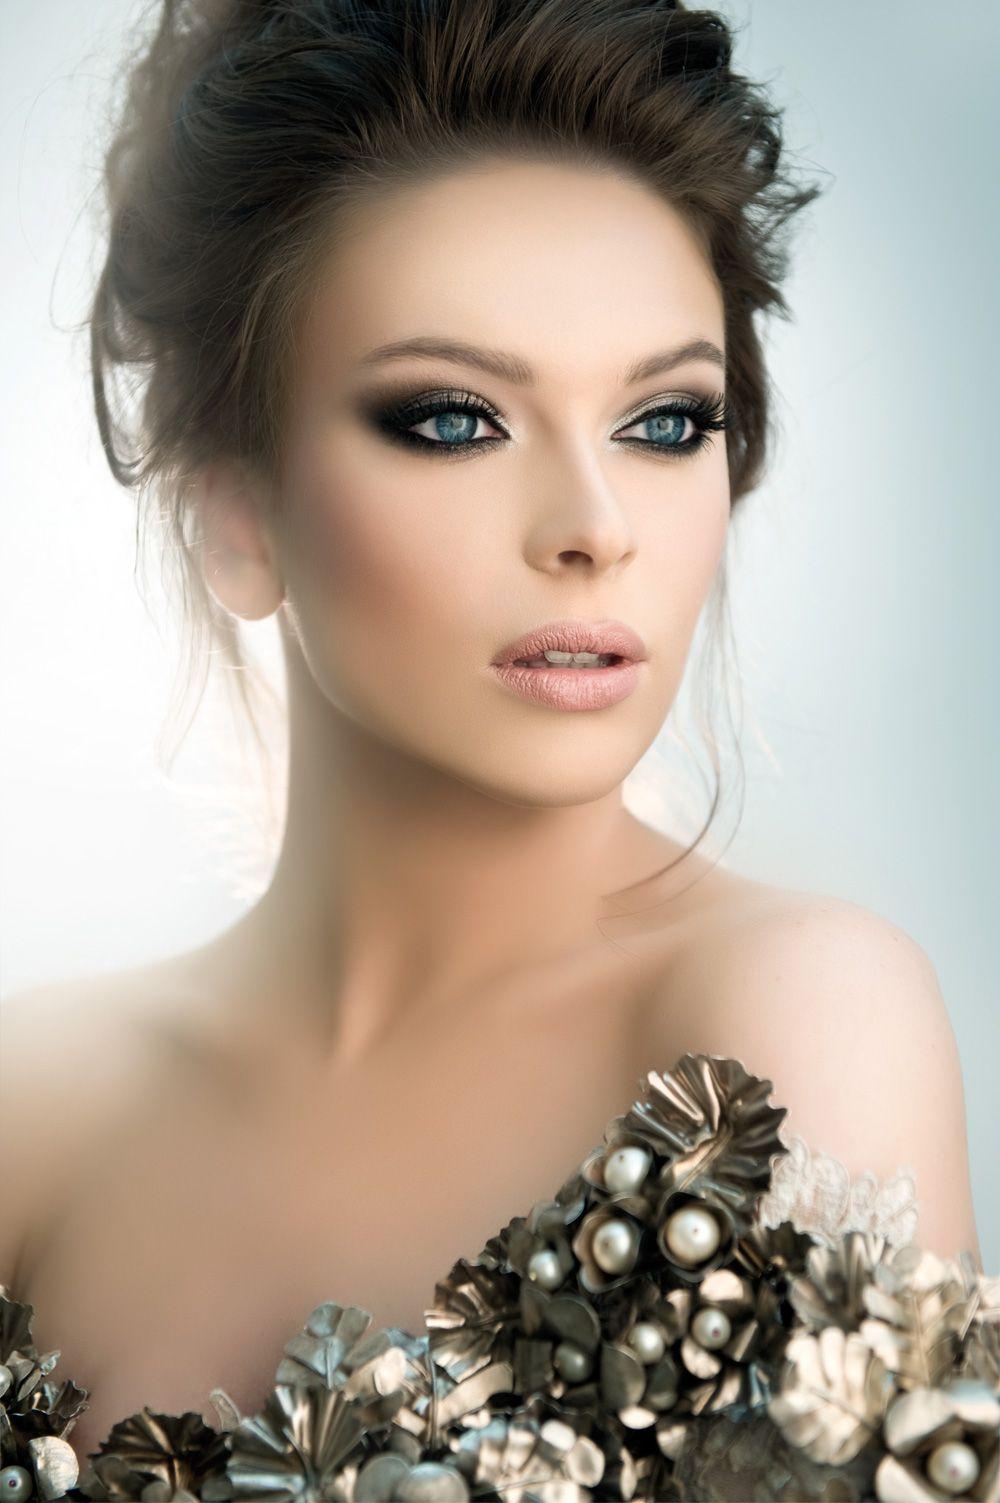 FADY KATAYA BRIDAL PHOTOSHOOT Wedding makeup